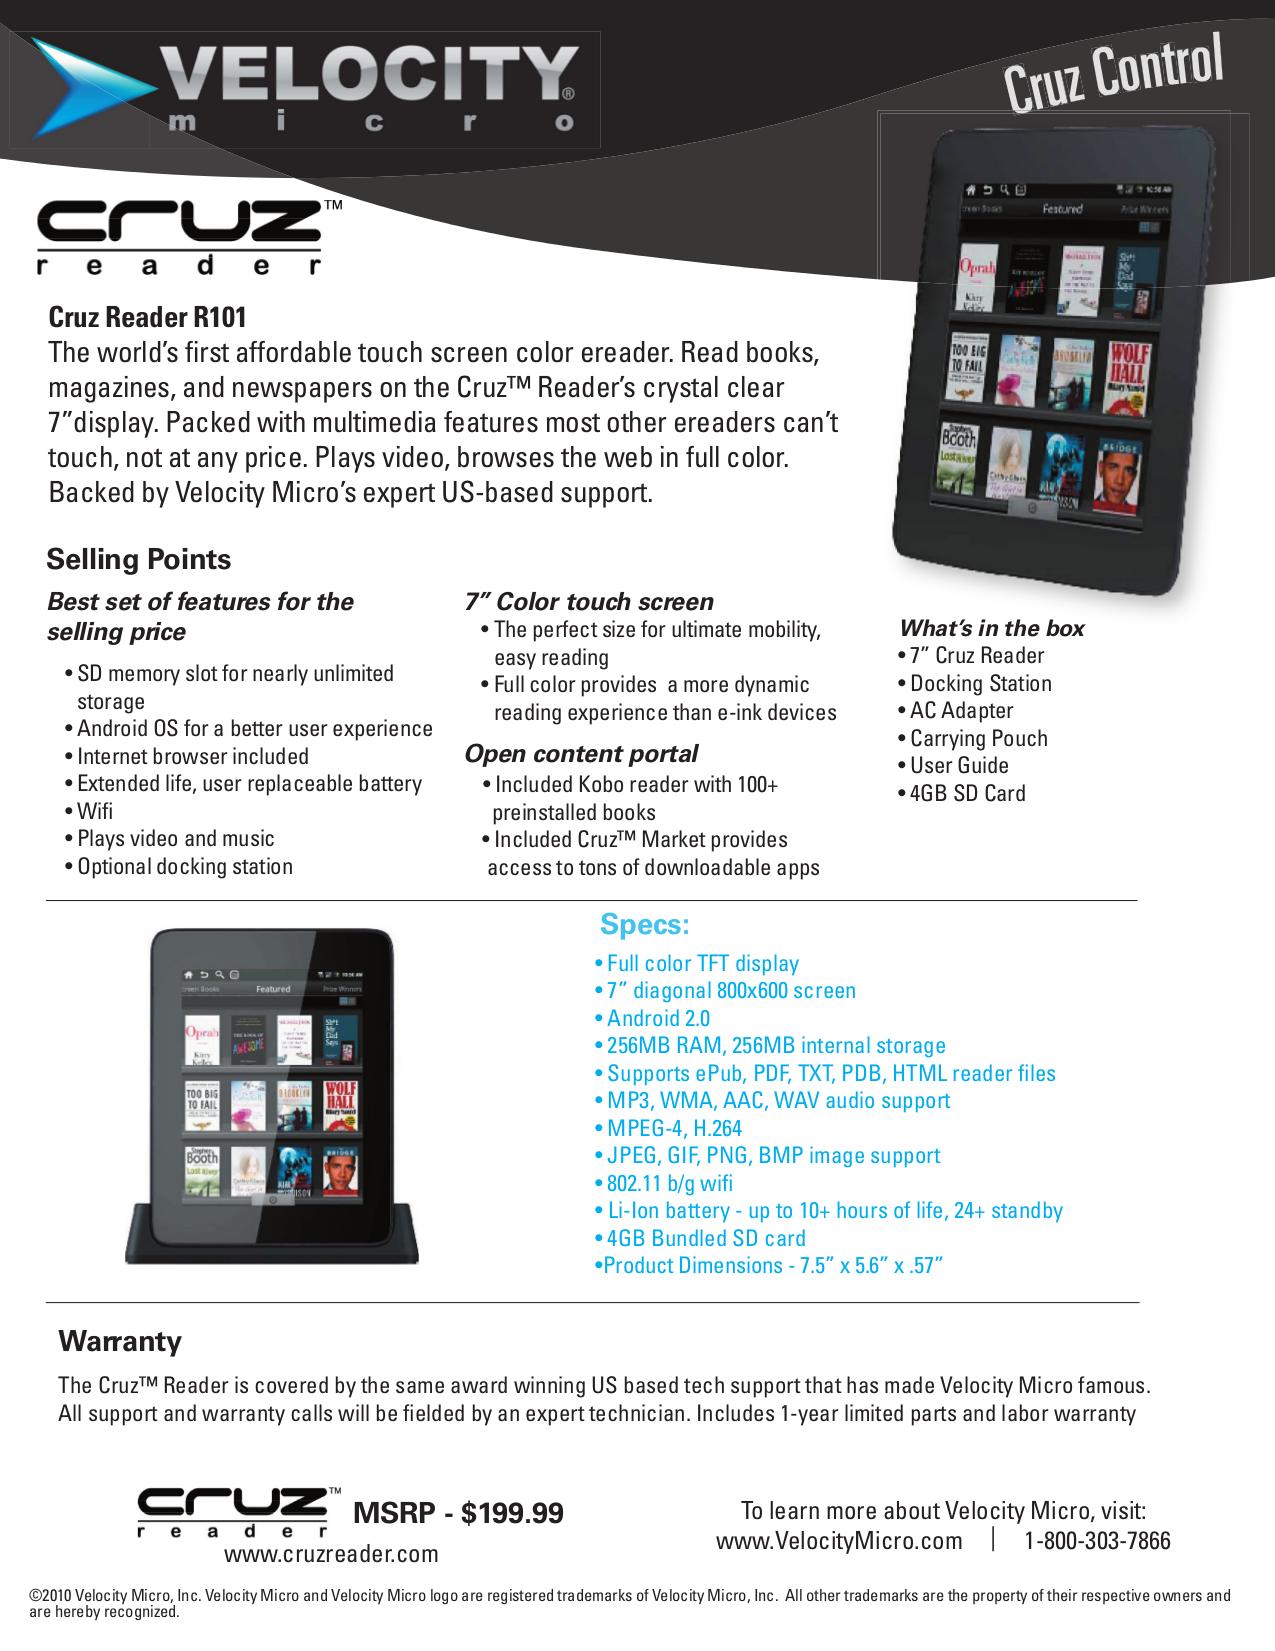 download free pdf for velocity cruz r101 tablet manual rh umlib com Cruz Reader Charger Cruz Reader Problems